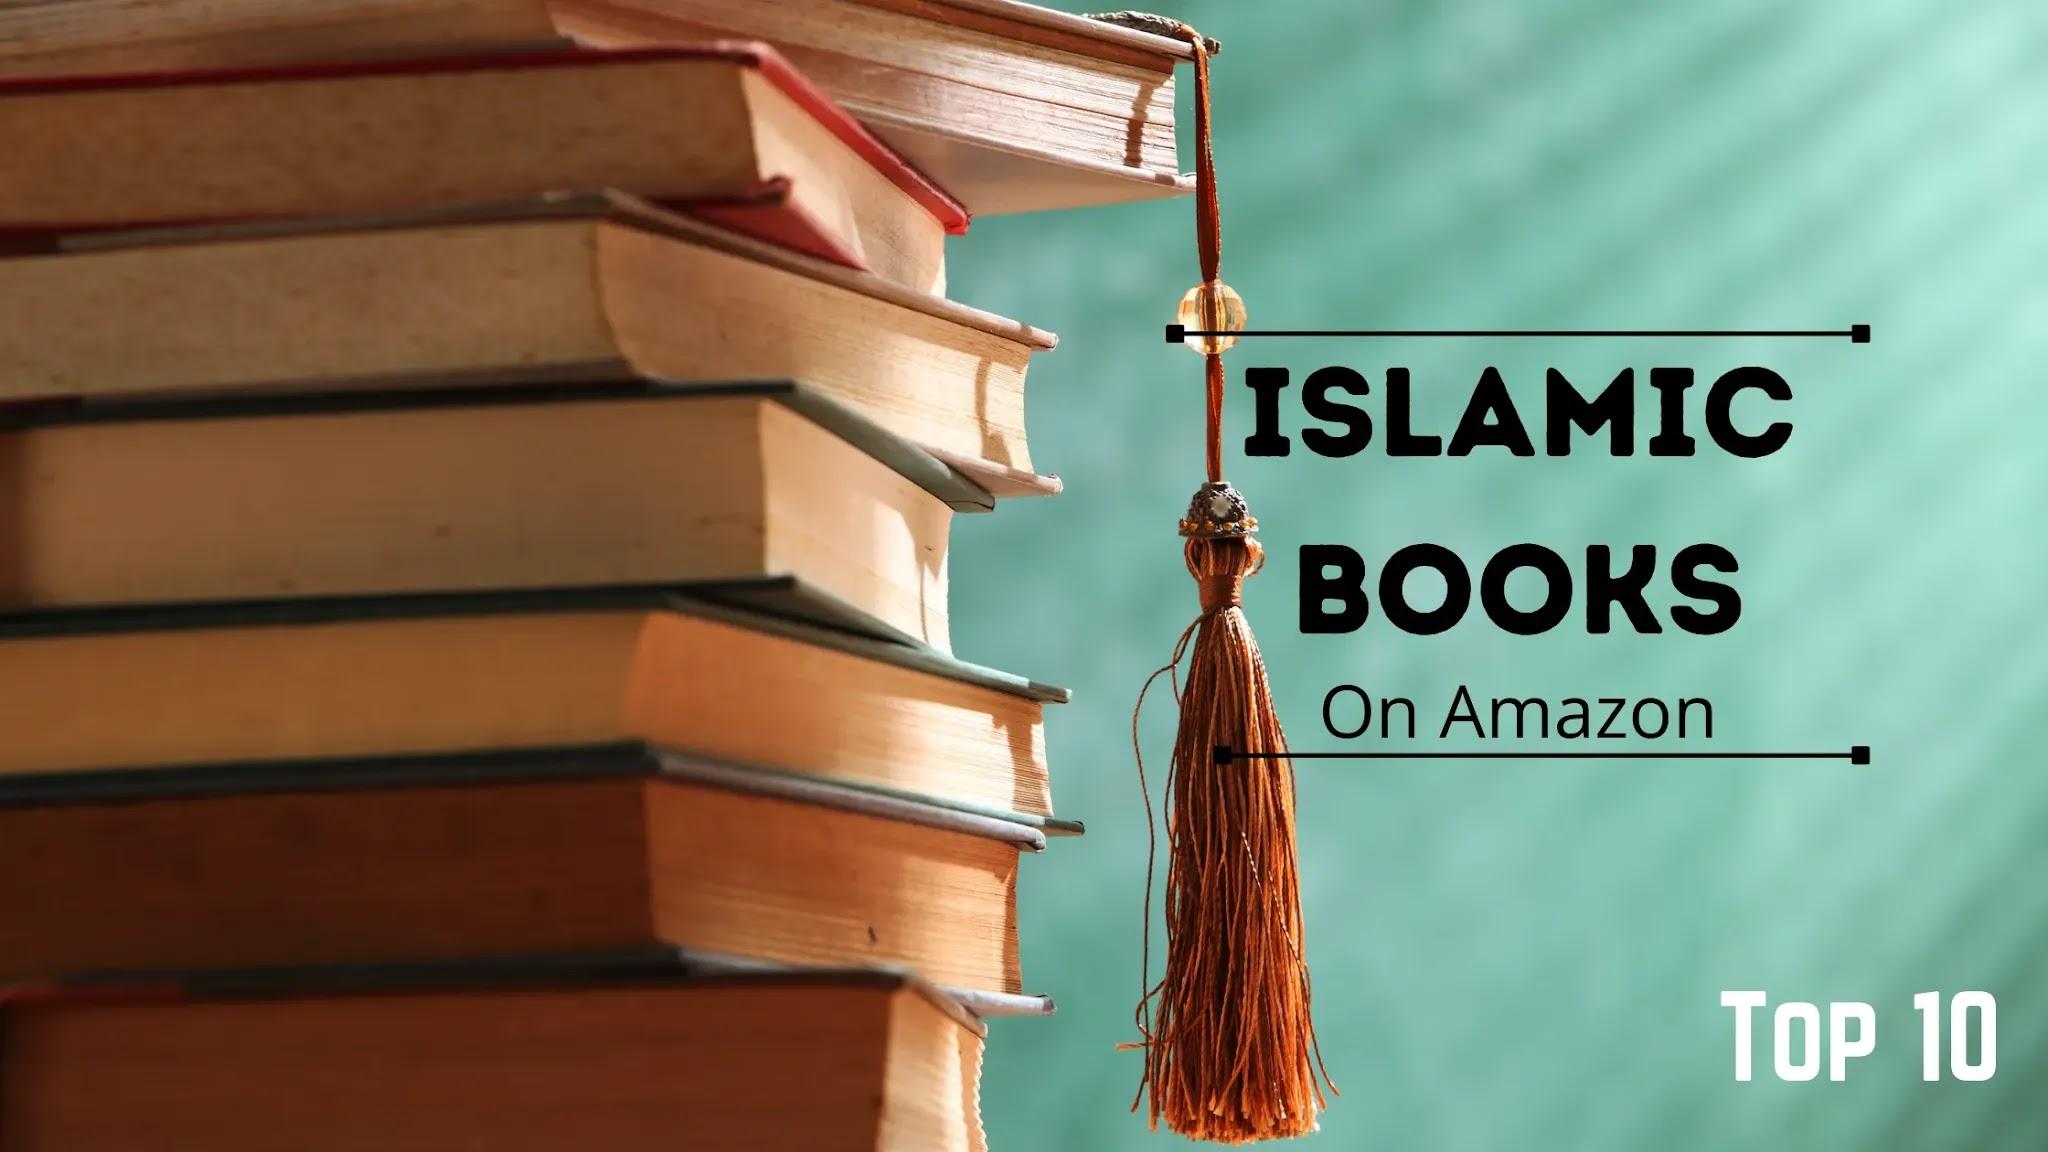 islamic books on amazon